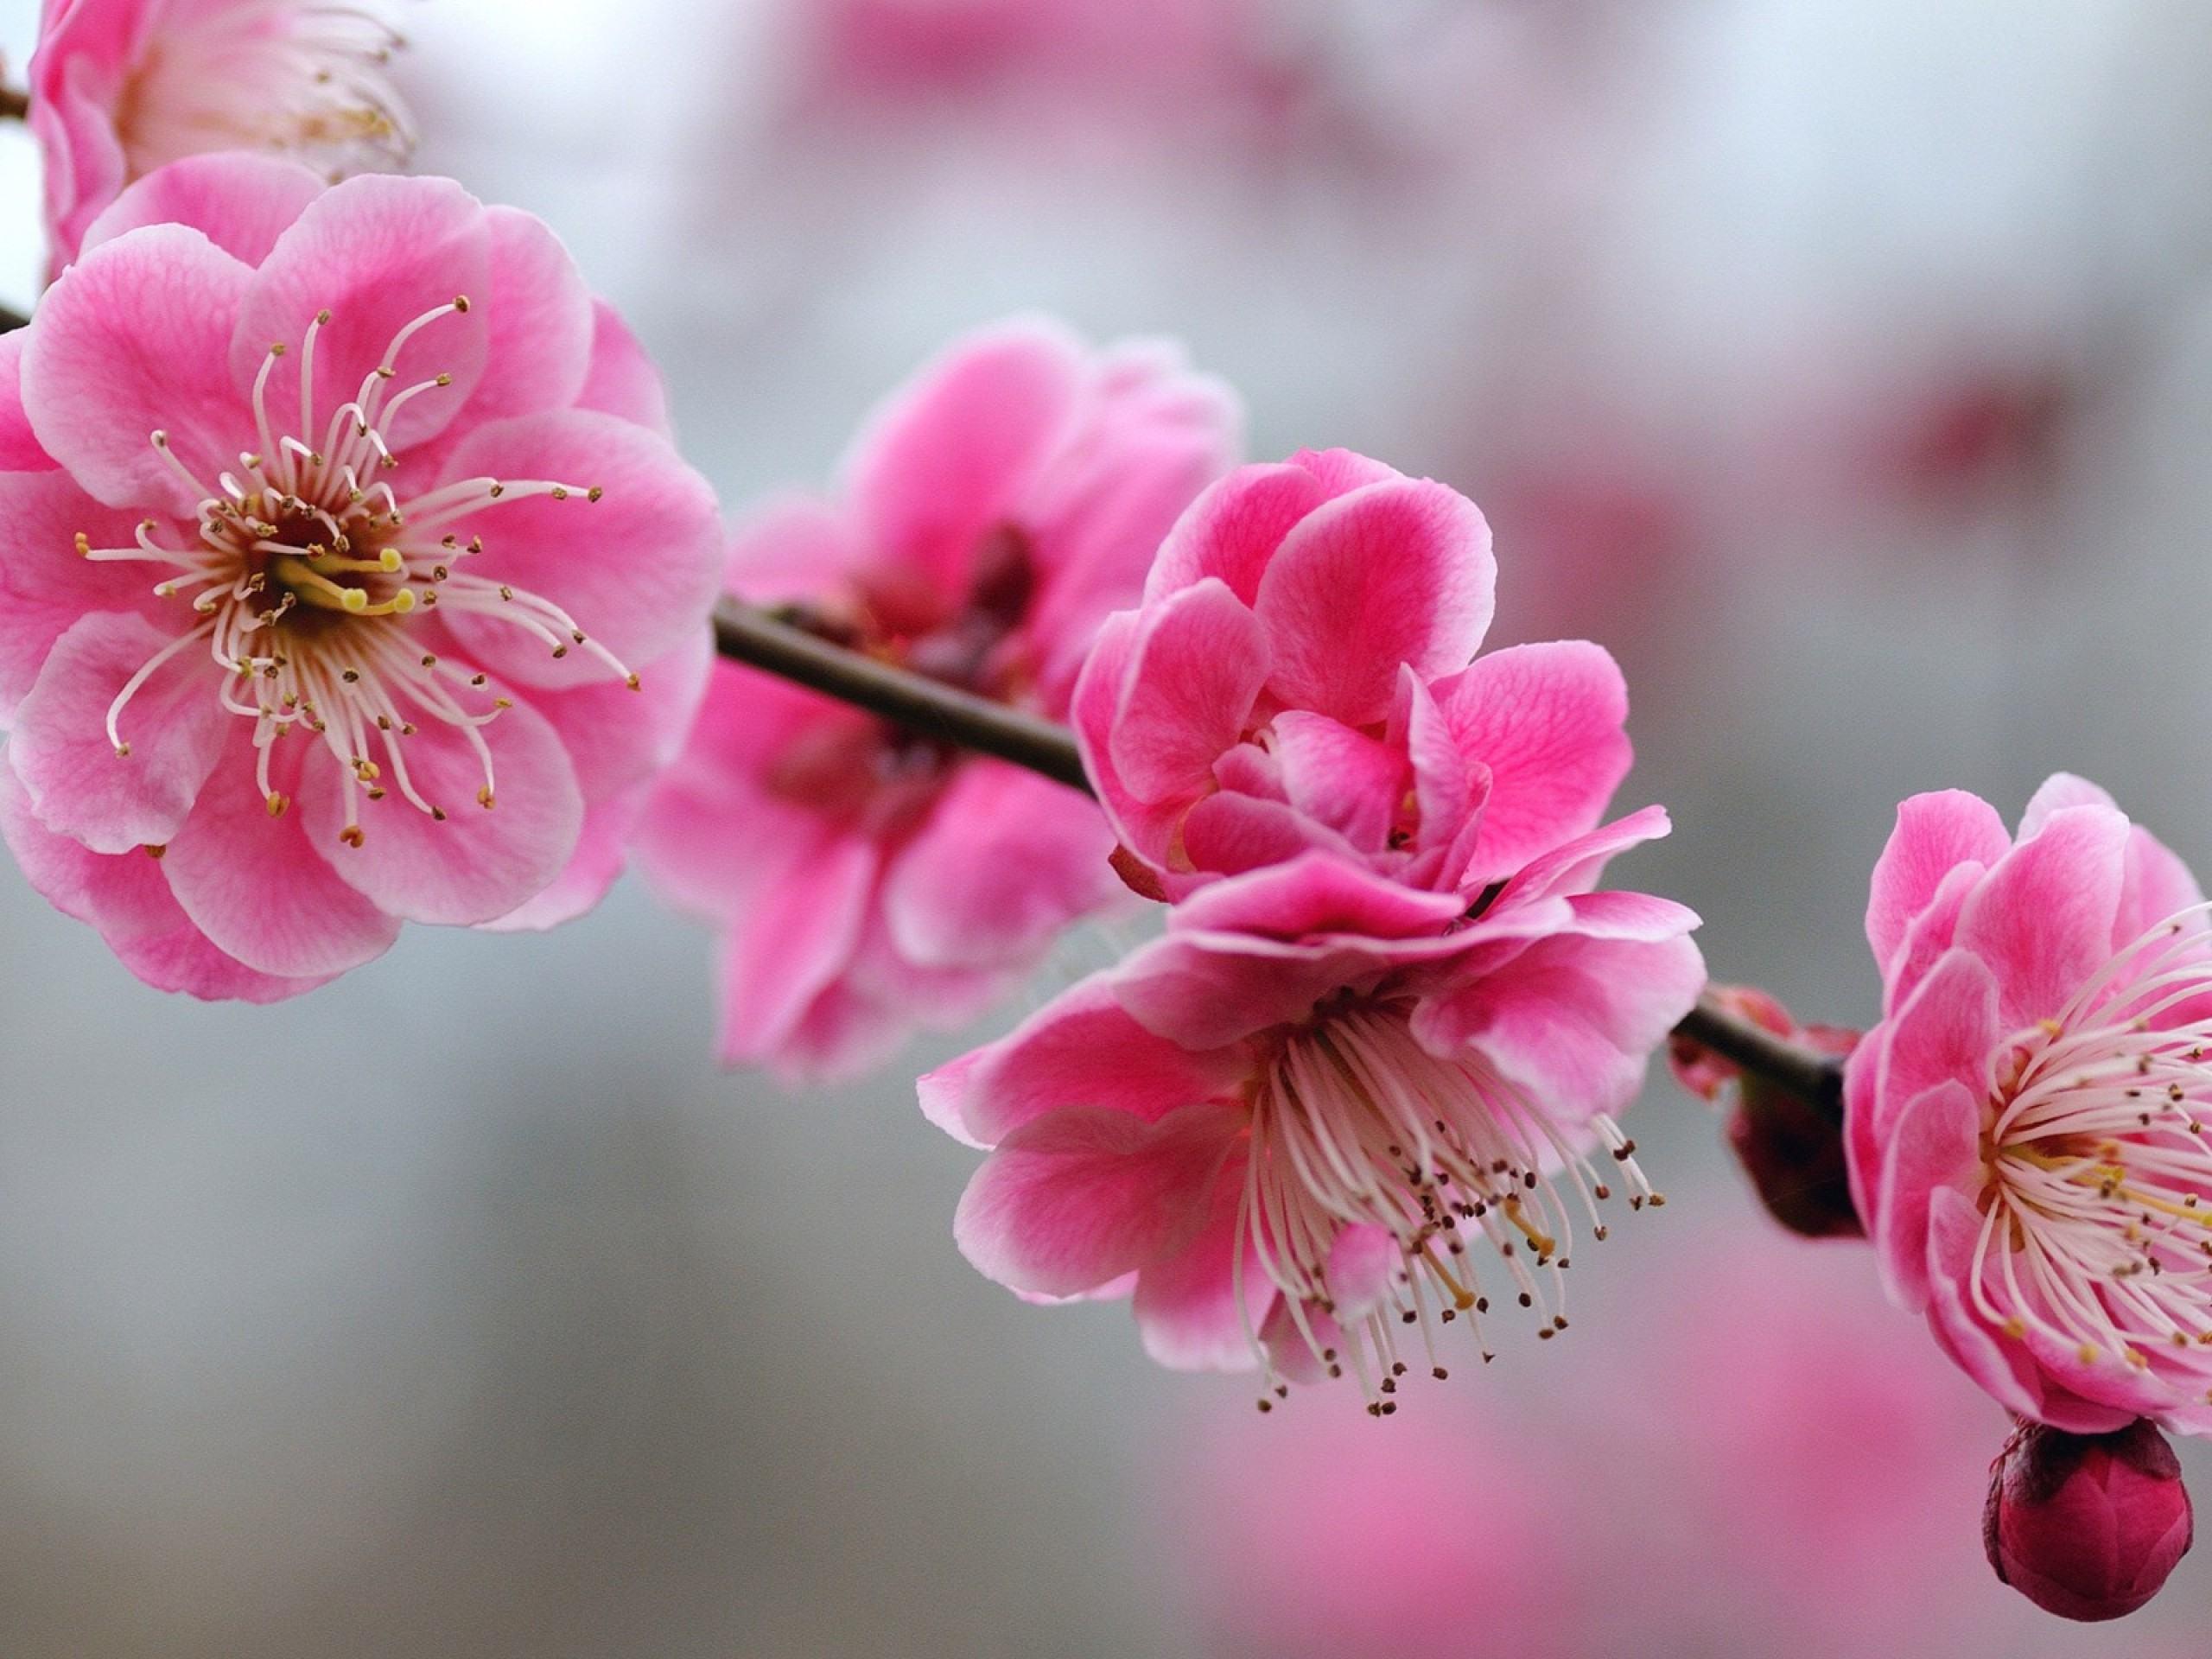 3d Blossoms Live Wallpaper Cute Girly Wallpapers A2 Hd Desktop Wallpapers 4k Hd